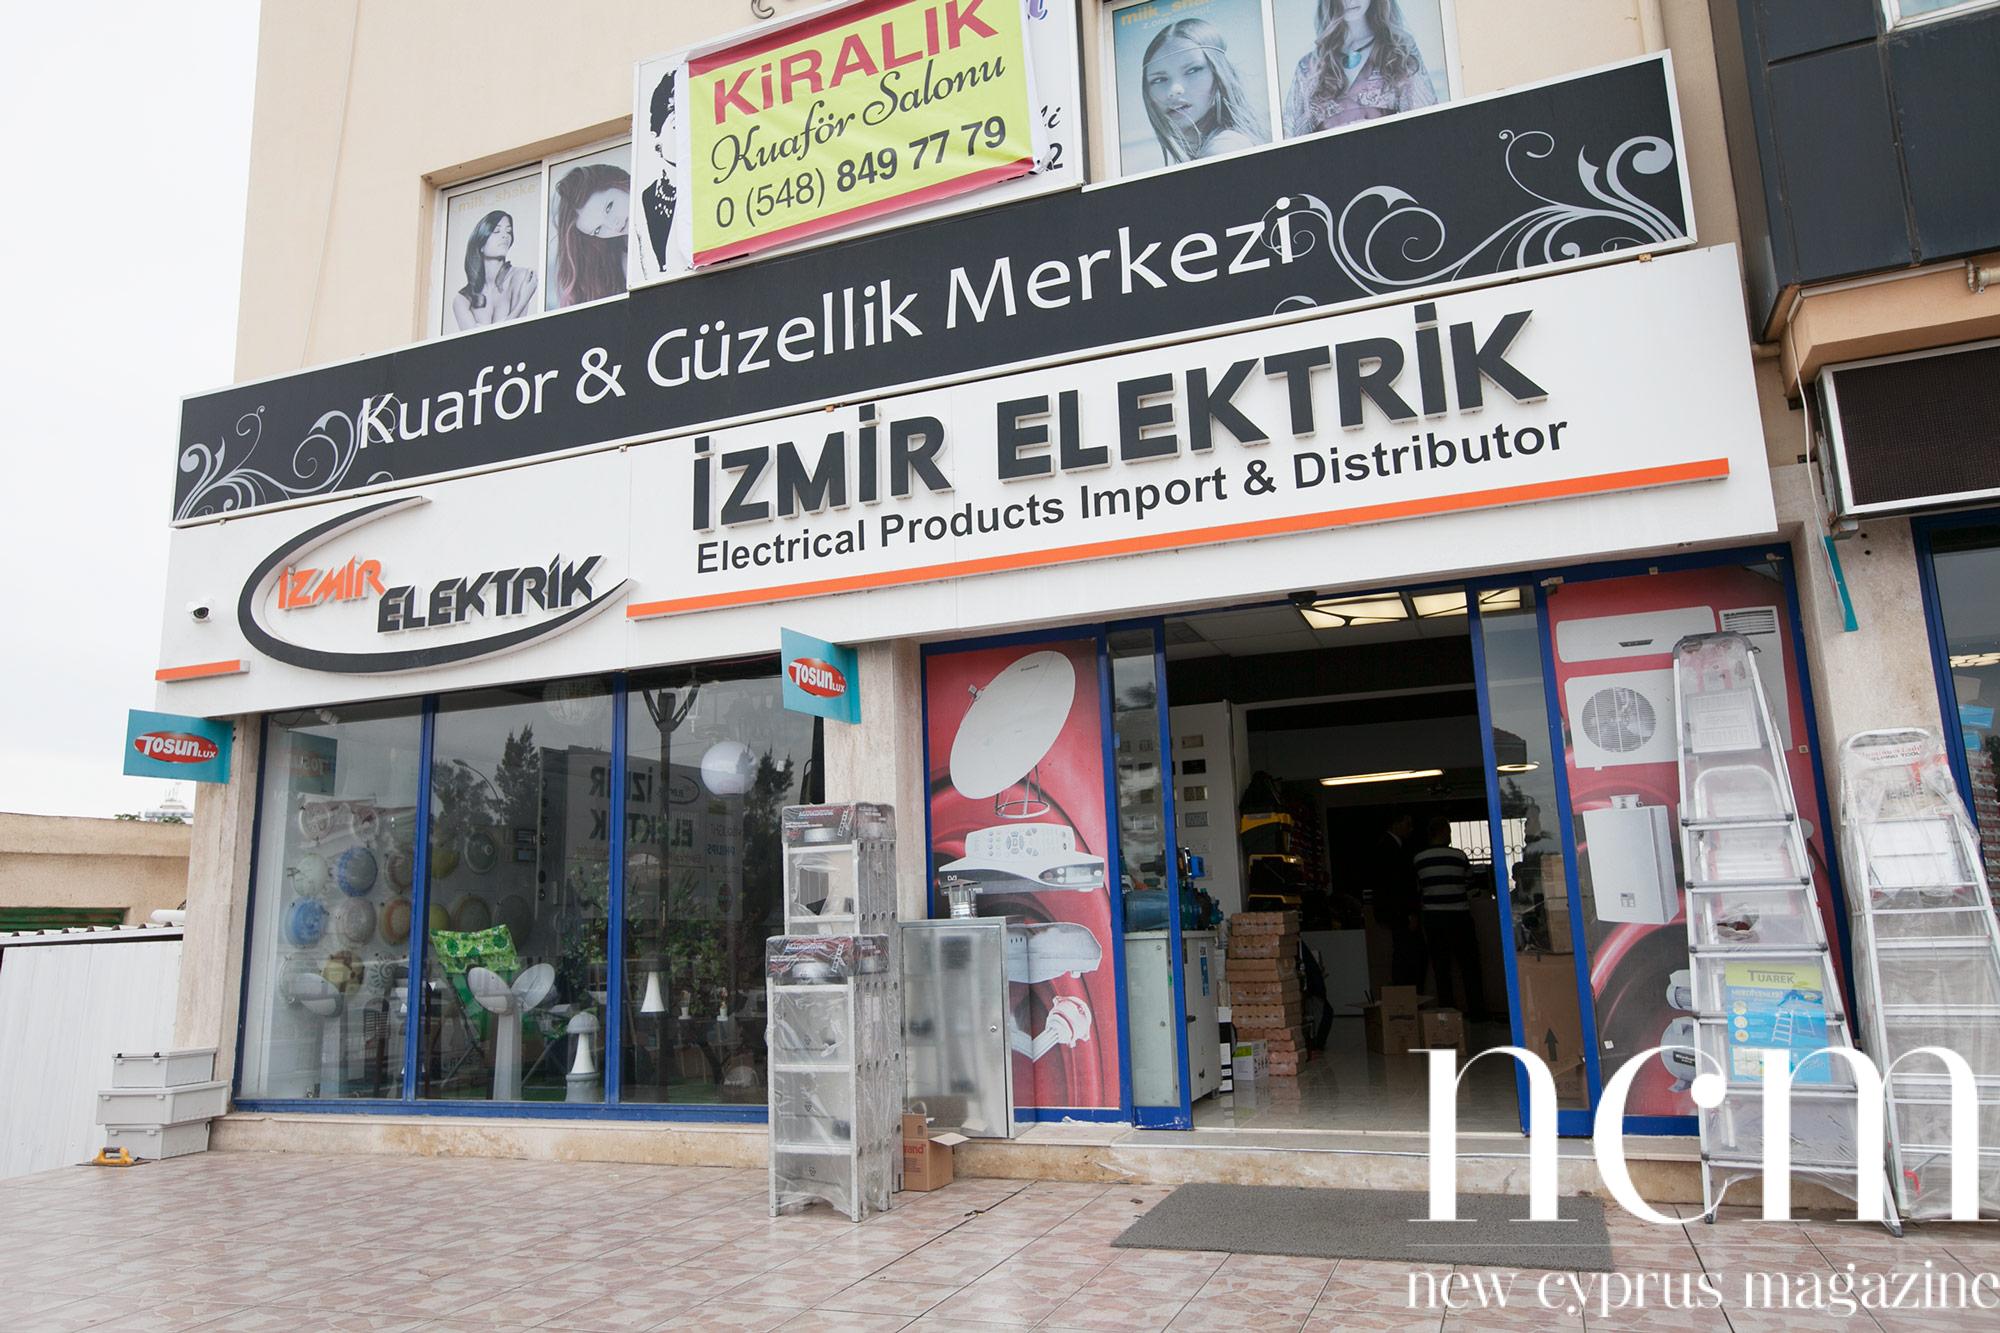 Izmir Elektrik Store in Famagusta